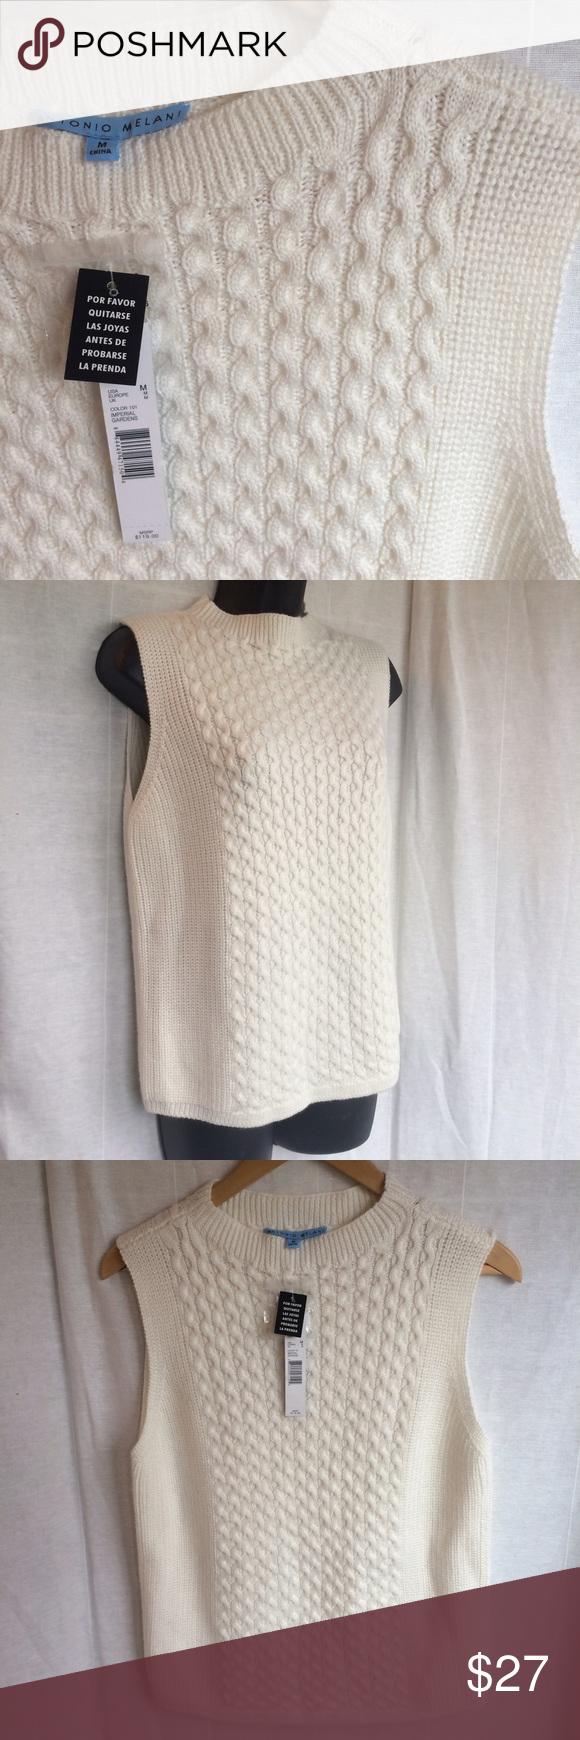 Nwt Antonio Melani Cream Cable Knit Sweater Vest Cable Knit Sweaters Sweater Vest Sweaters